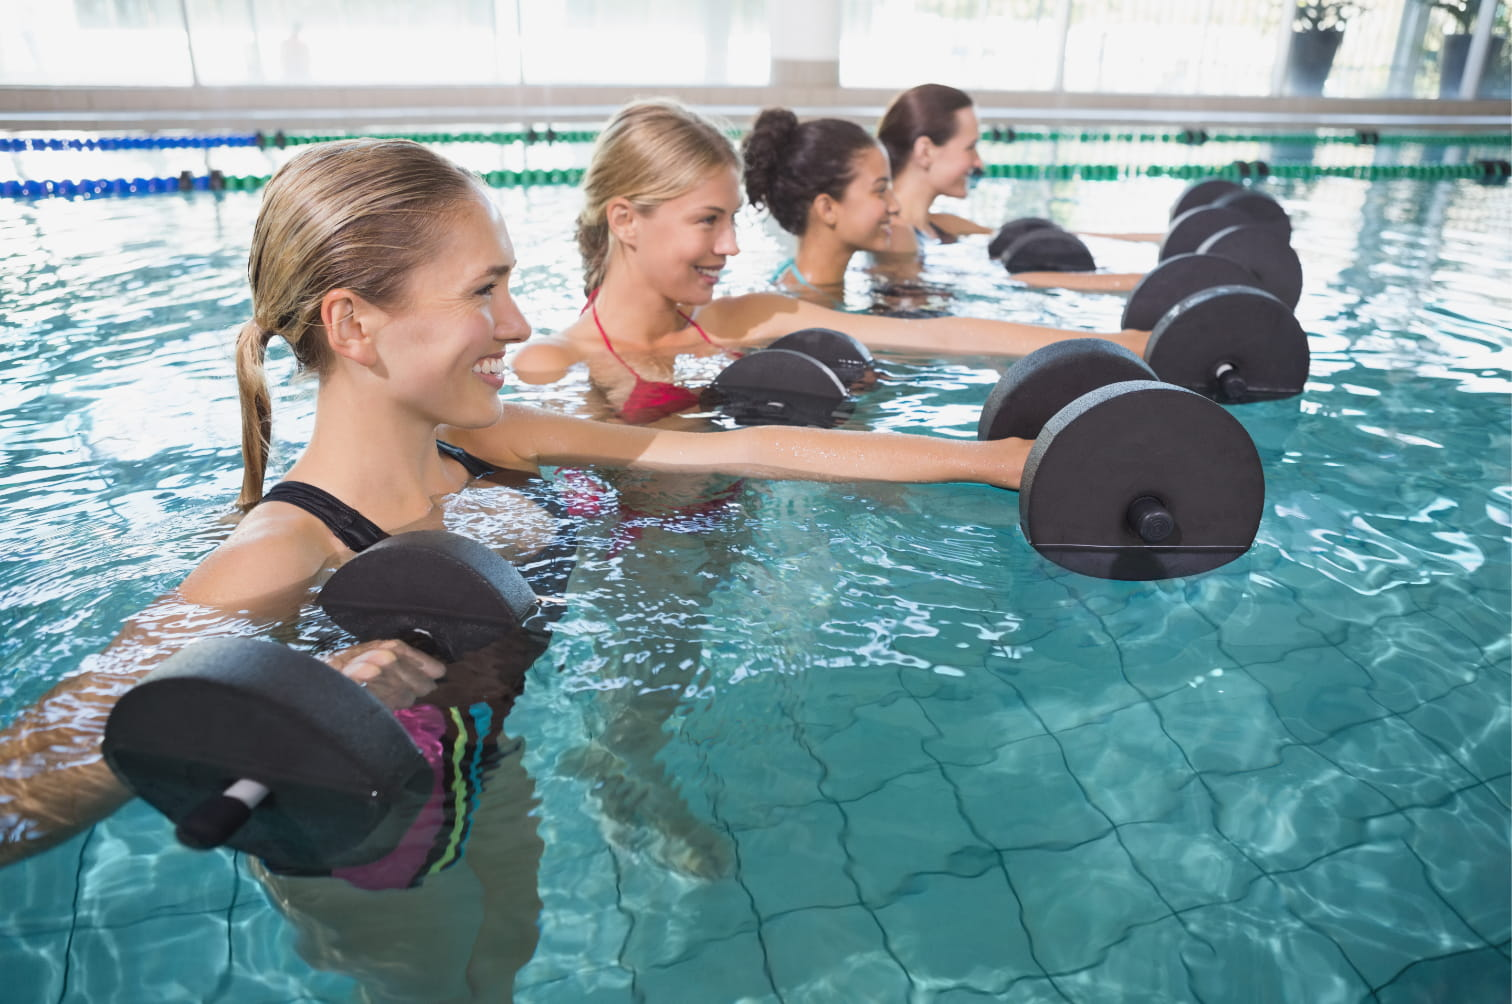 lago-figoi-corsi-fitness-acqua-acquacircuit